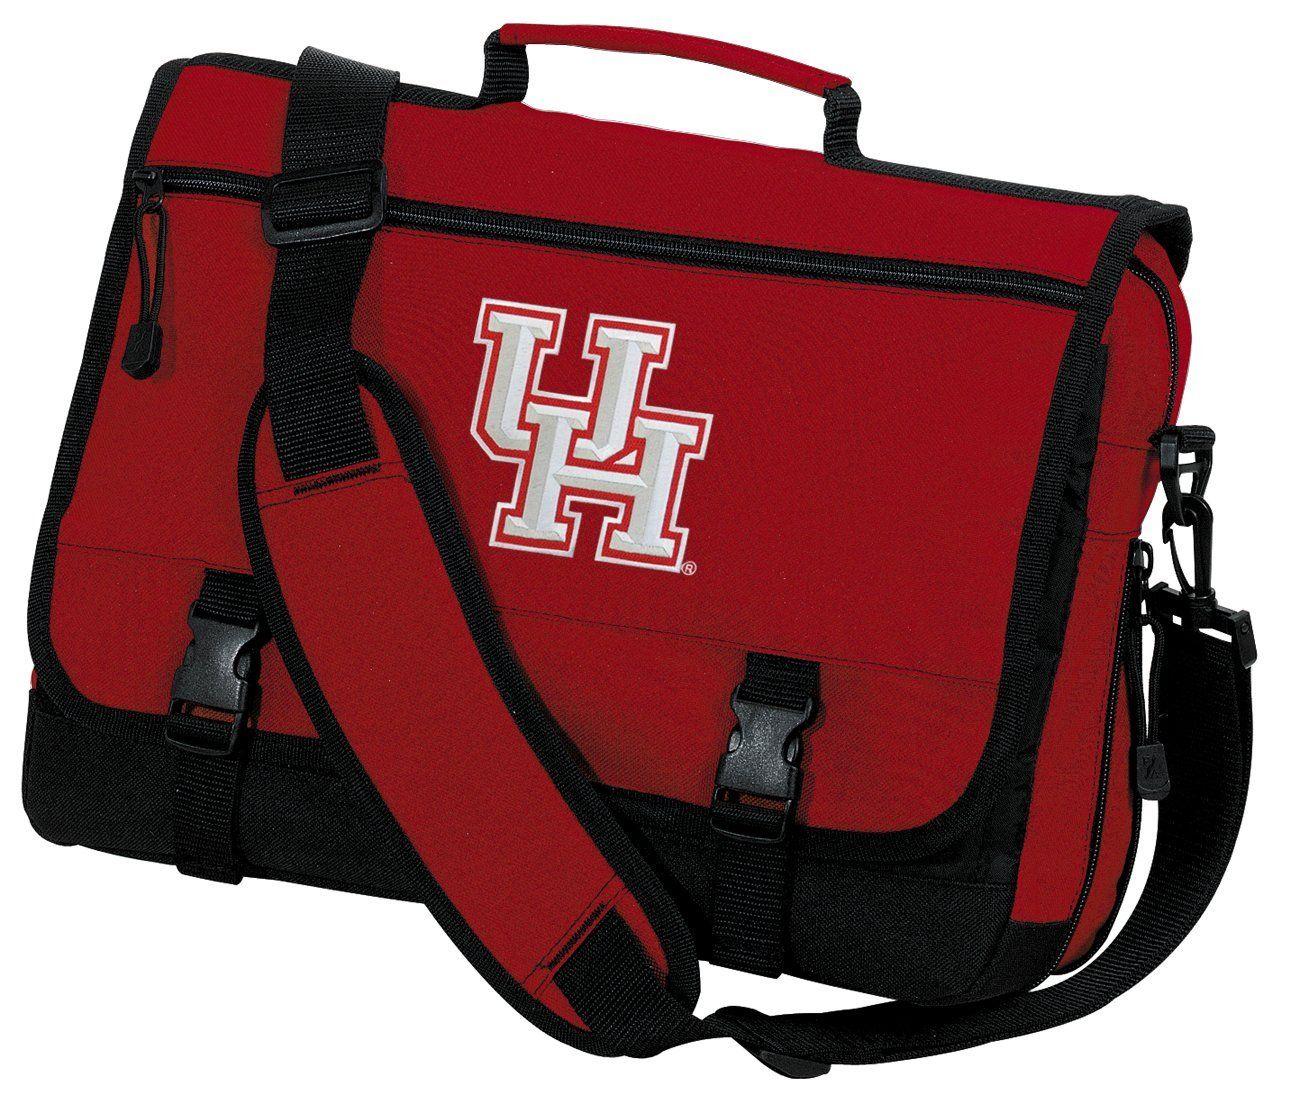 Amazon Com University Of Houston Laptop Bag Uh Messenger Bag Or Computer Bag Sports Outdoors With Images Messenger Bag Bags School Bags